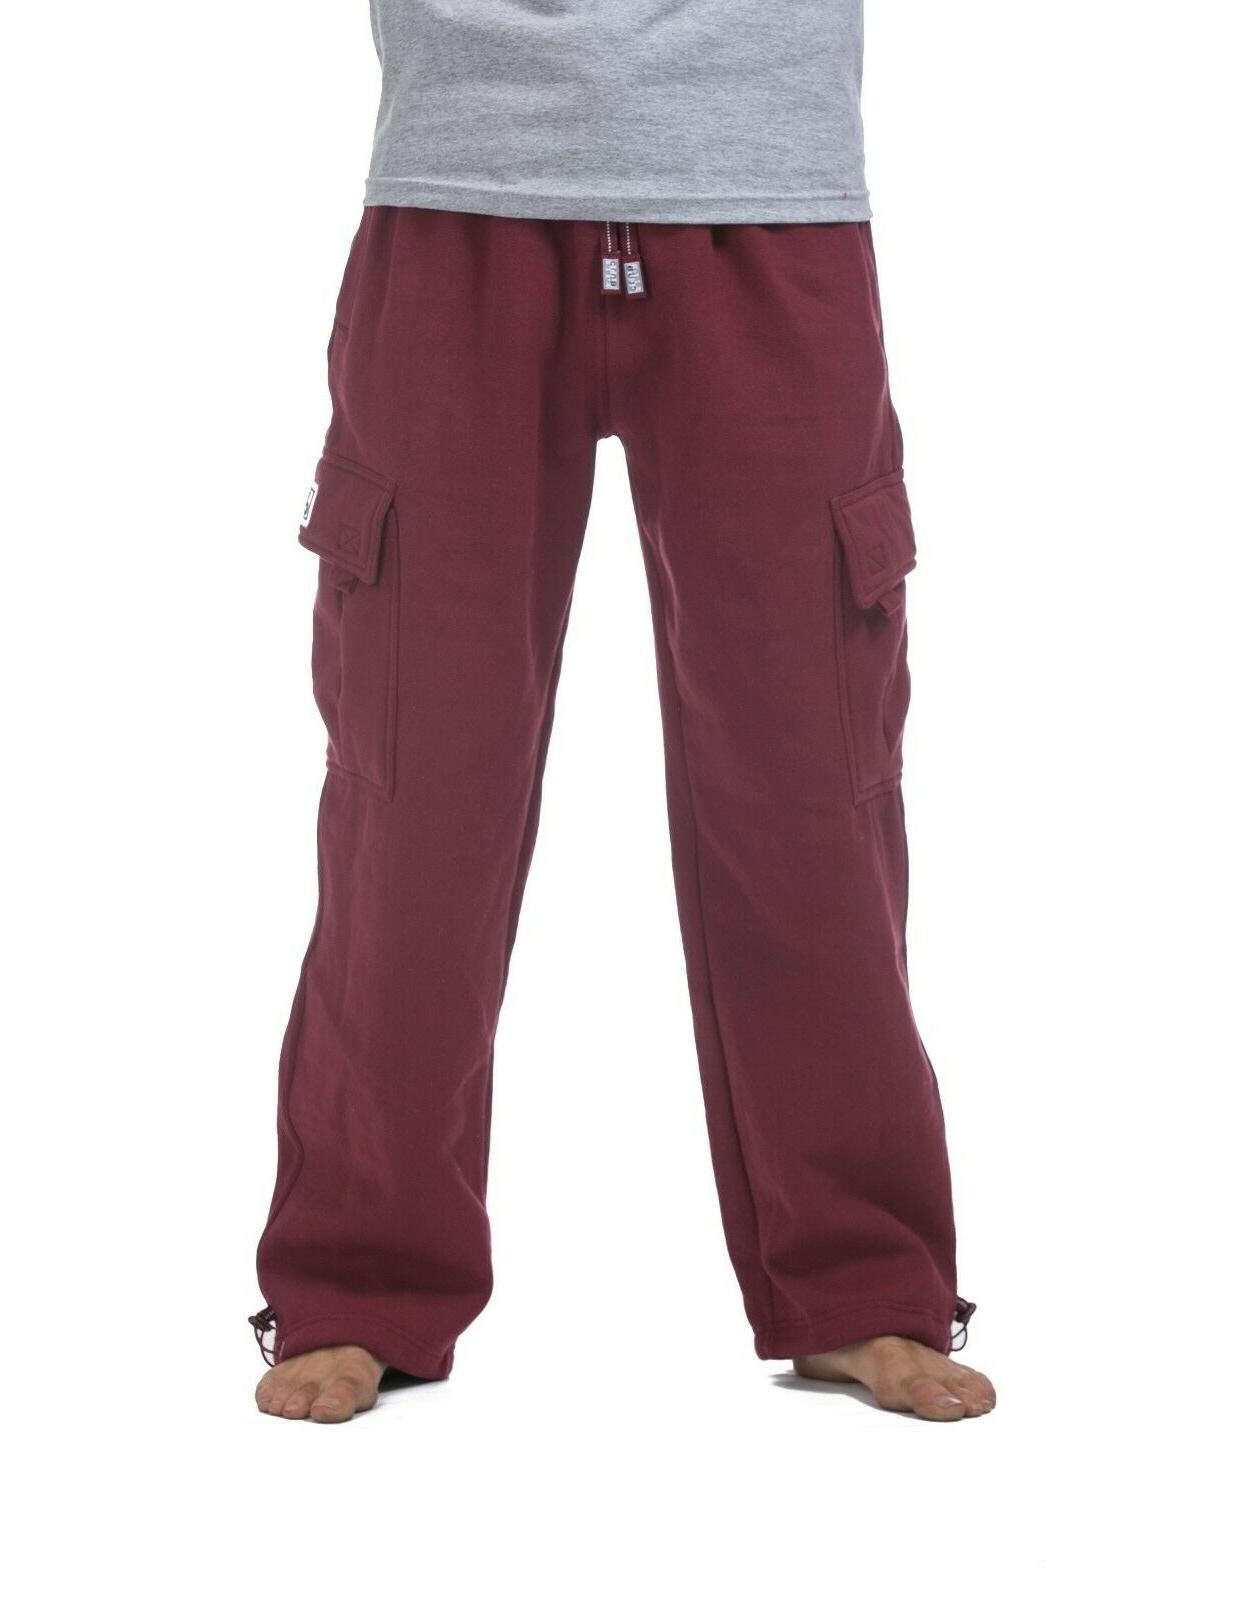 Pro Club Heavyweight Fleece Pants